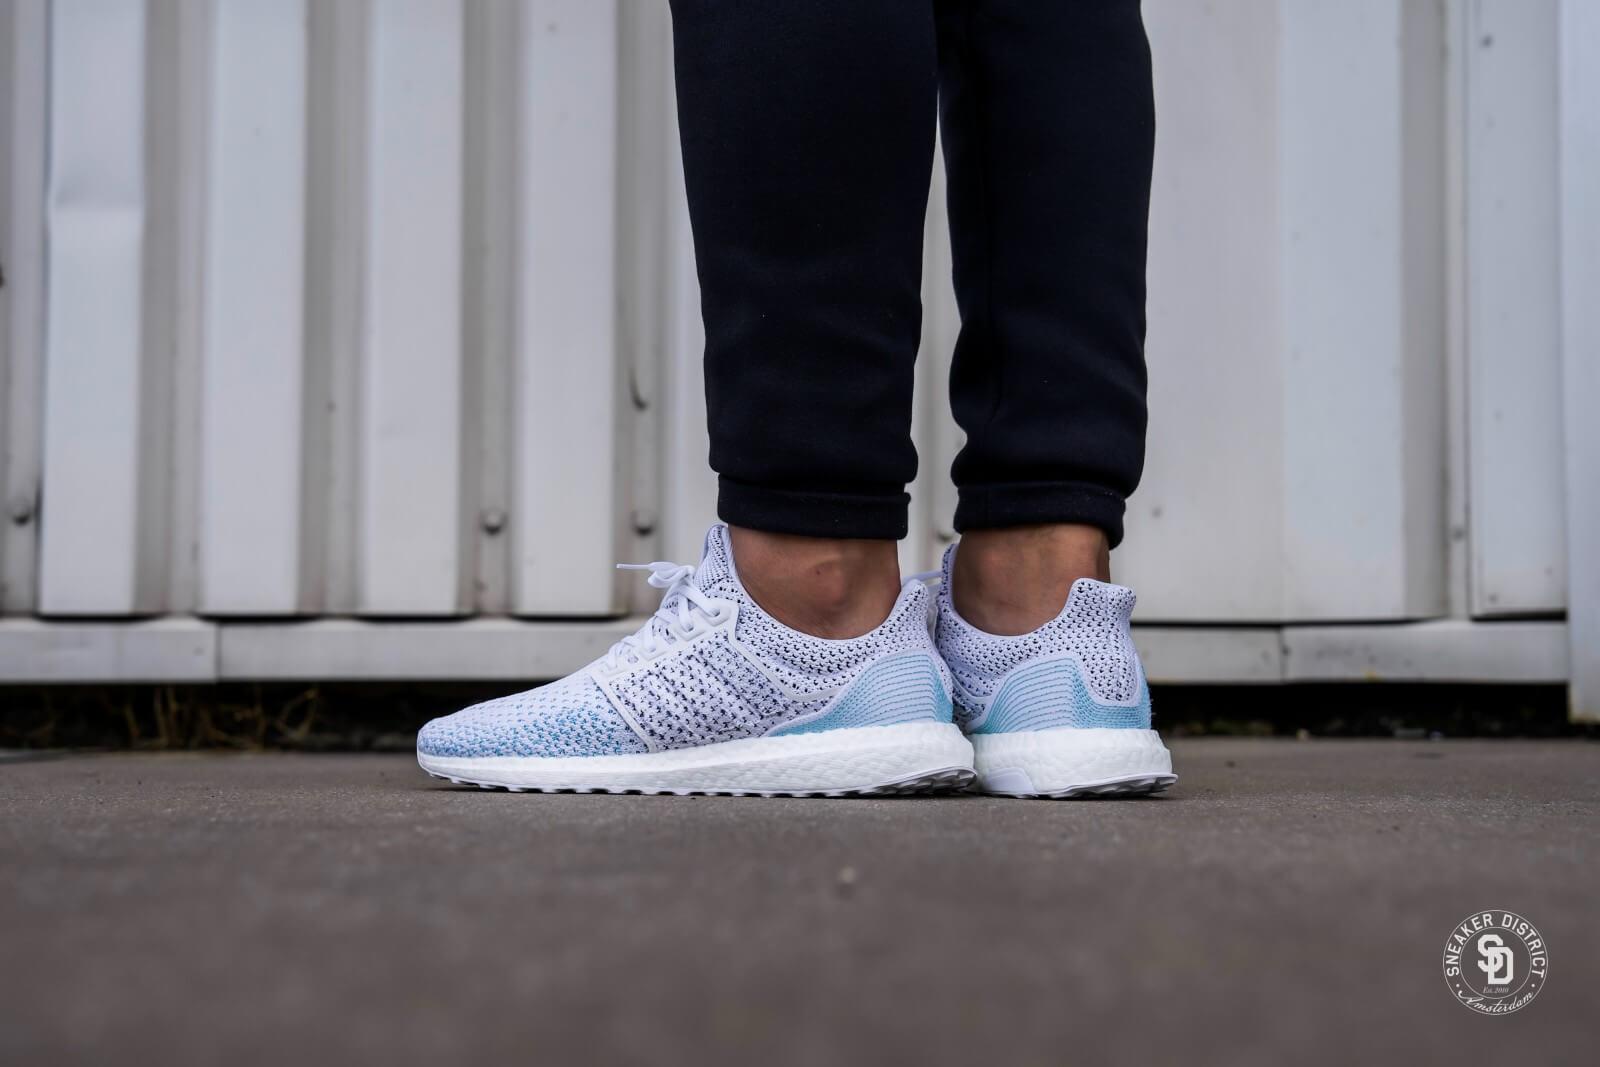 ultraboost x parley ltd shoes